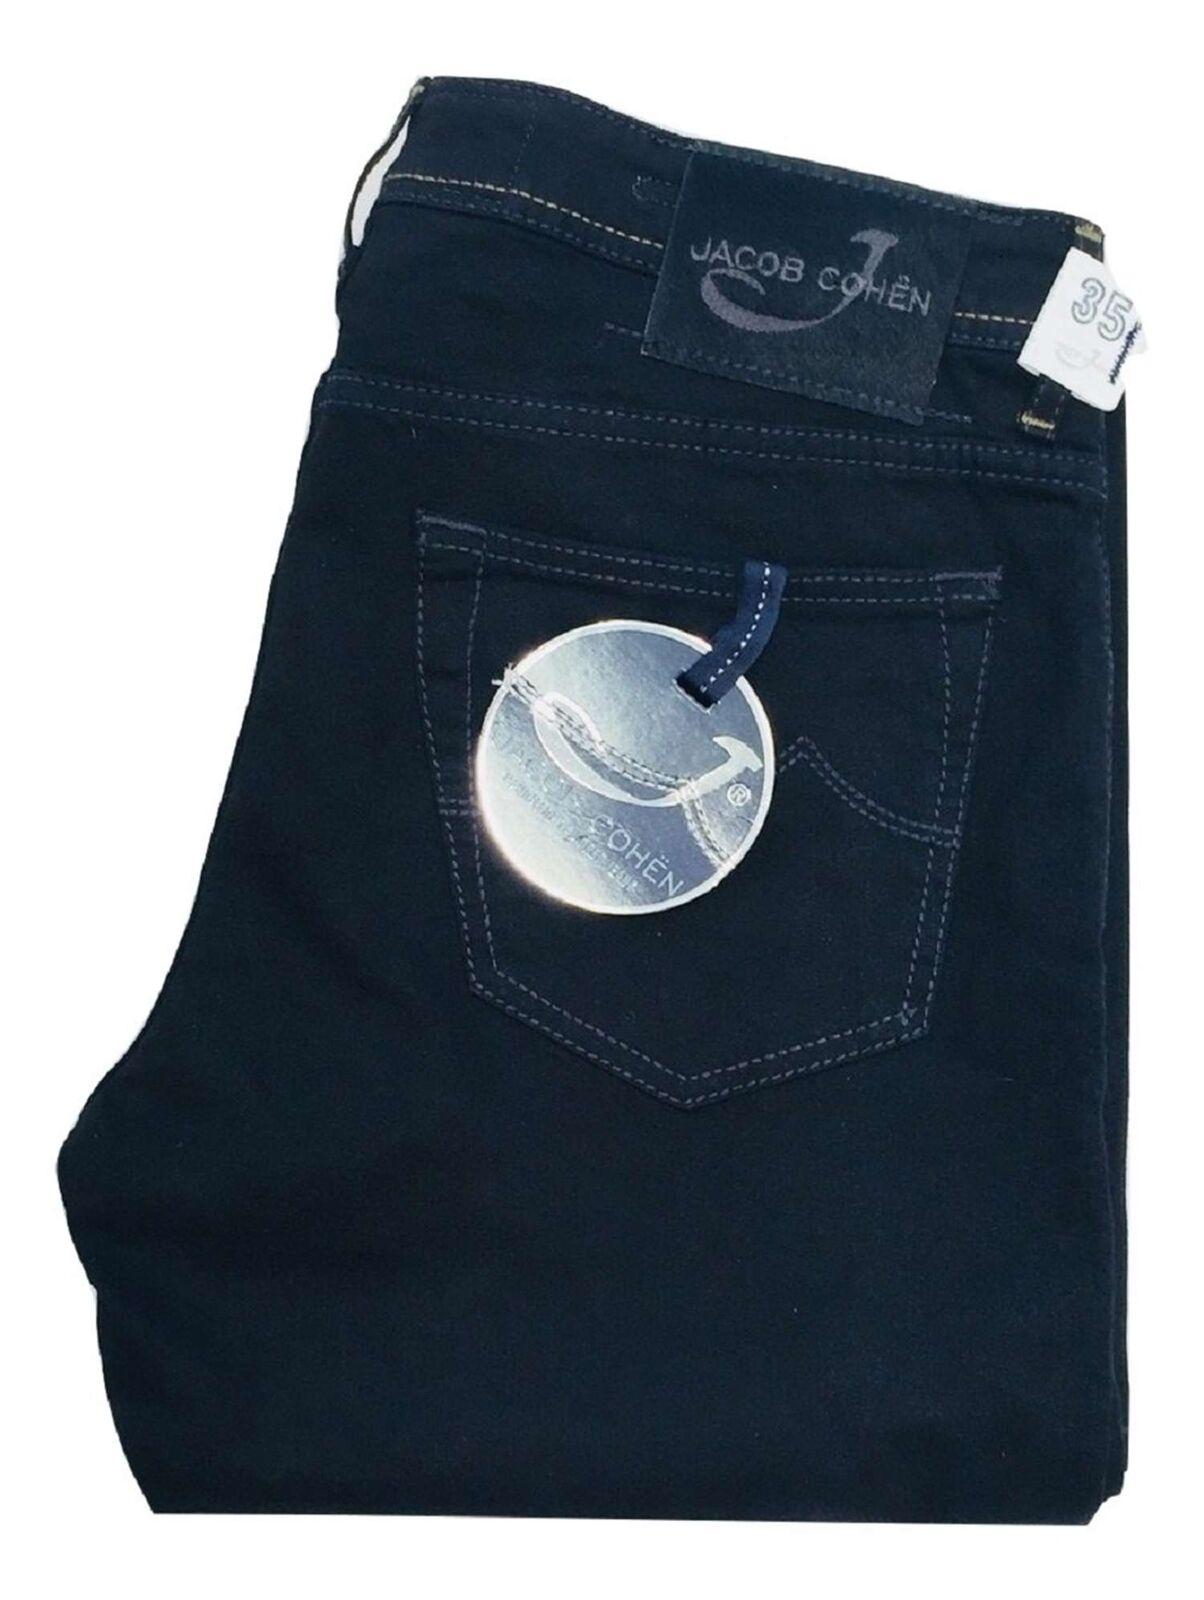 Jeans men Jacob Cohen J622 COMF 07869004-1891 Autunno Inverno